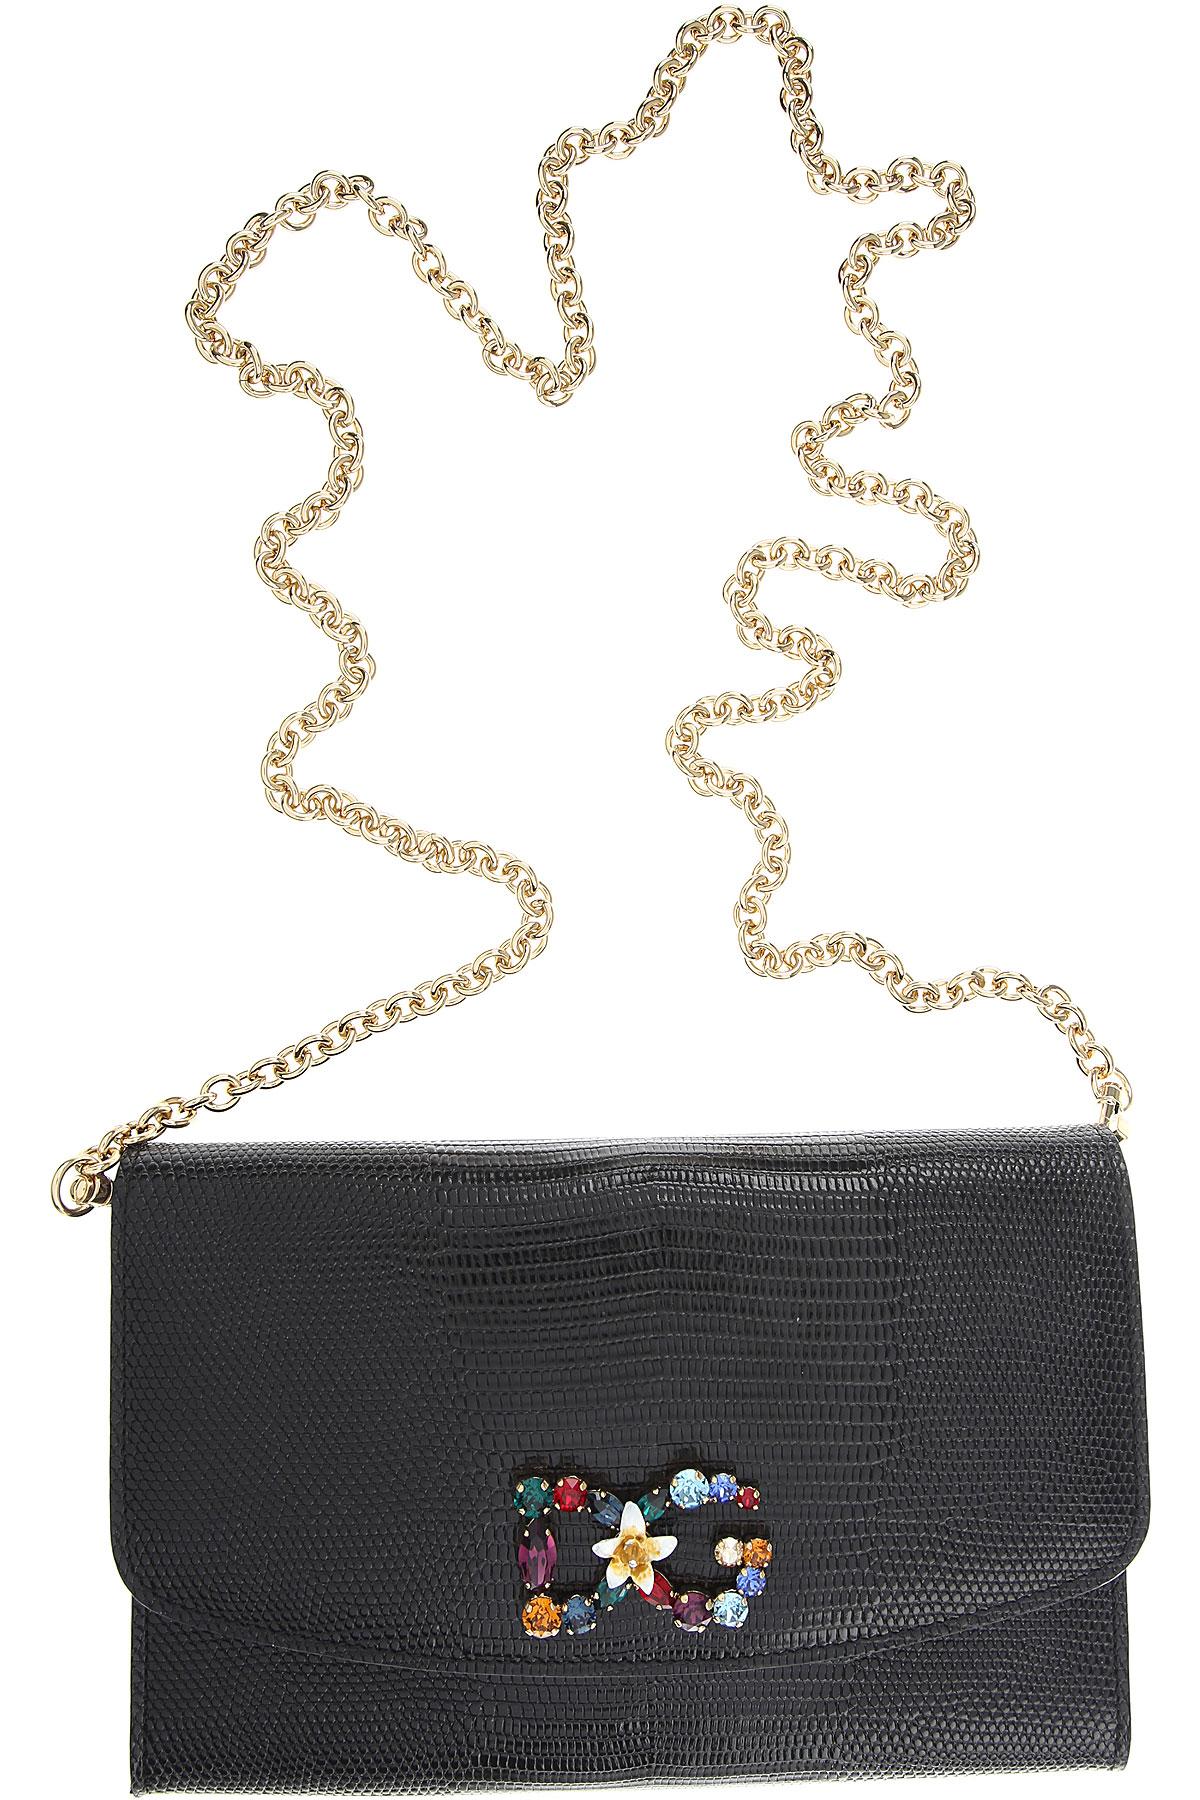 Dolce & Gabbana Clutch Bag, Black, Leather, 2017